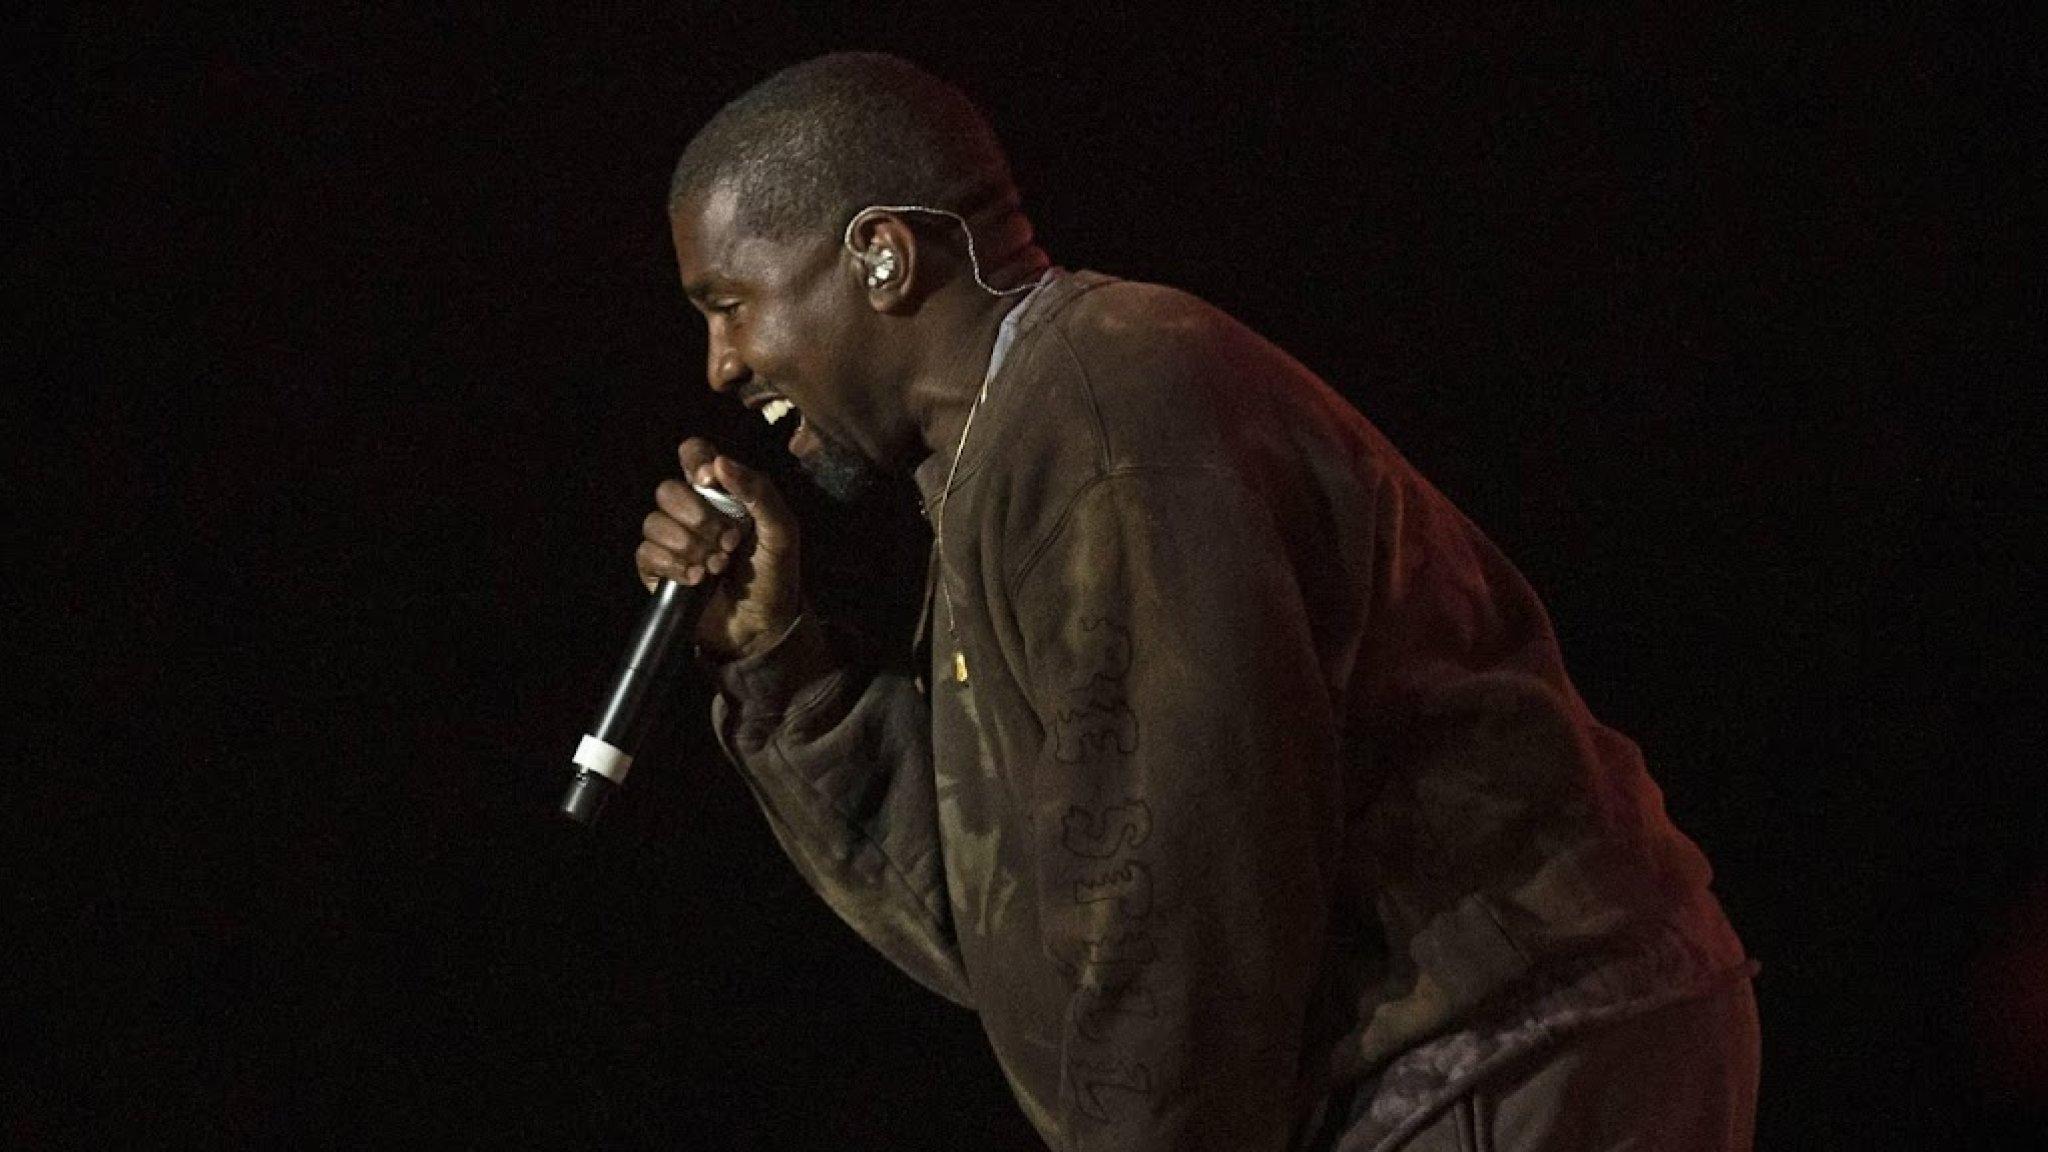 Kanye West's new album hits #1 on Apple Music